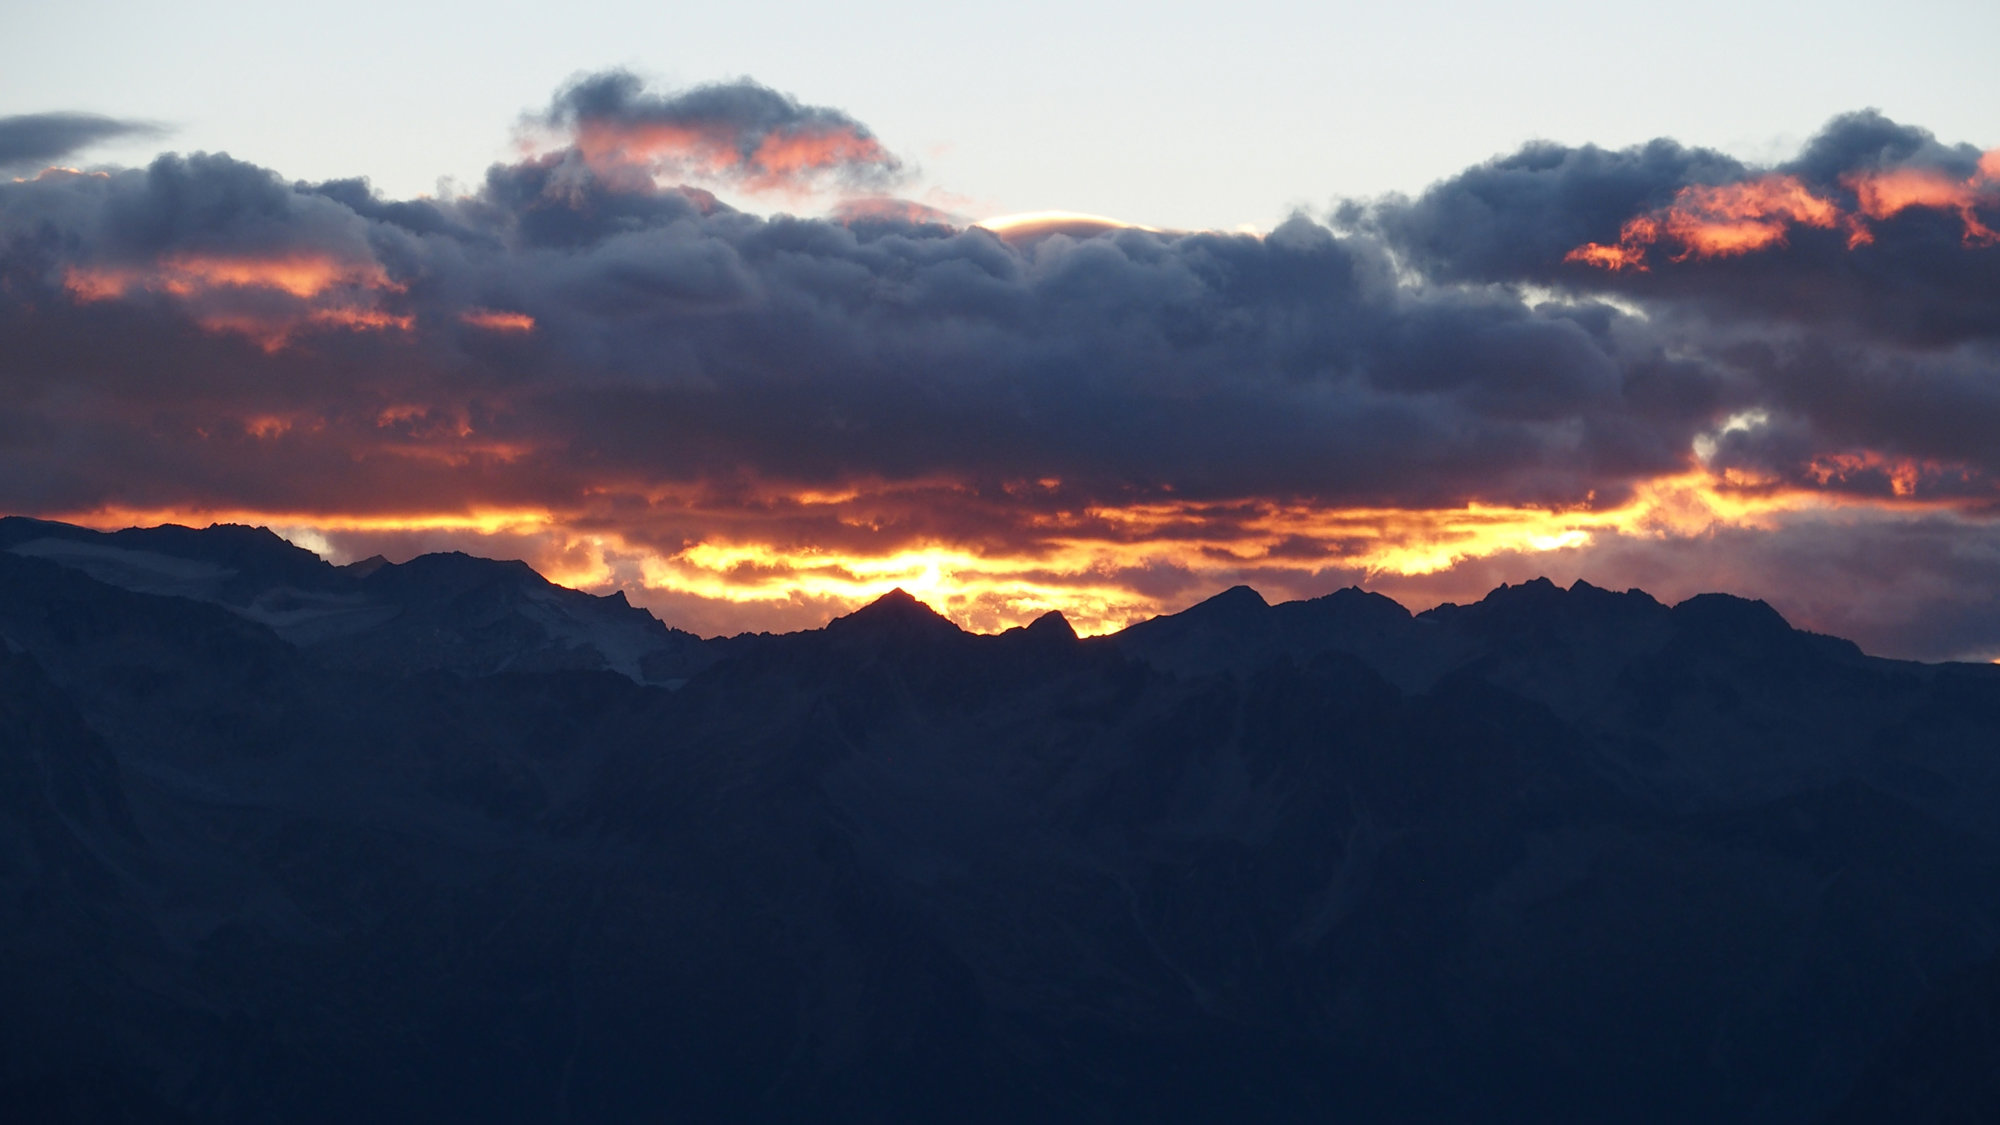 Sonnenaufgang Pedrotti Tosa, Brenta, Klettersteig, Dolomiten